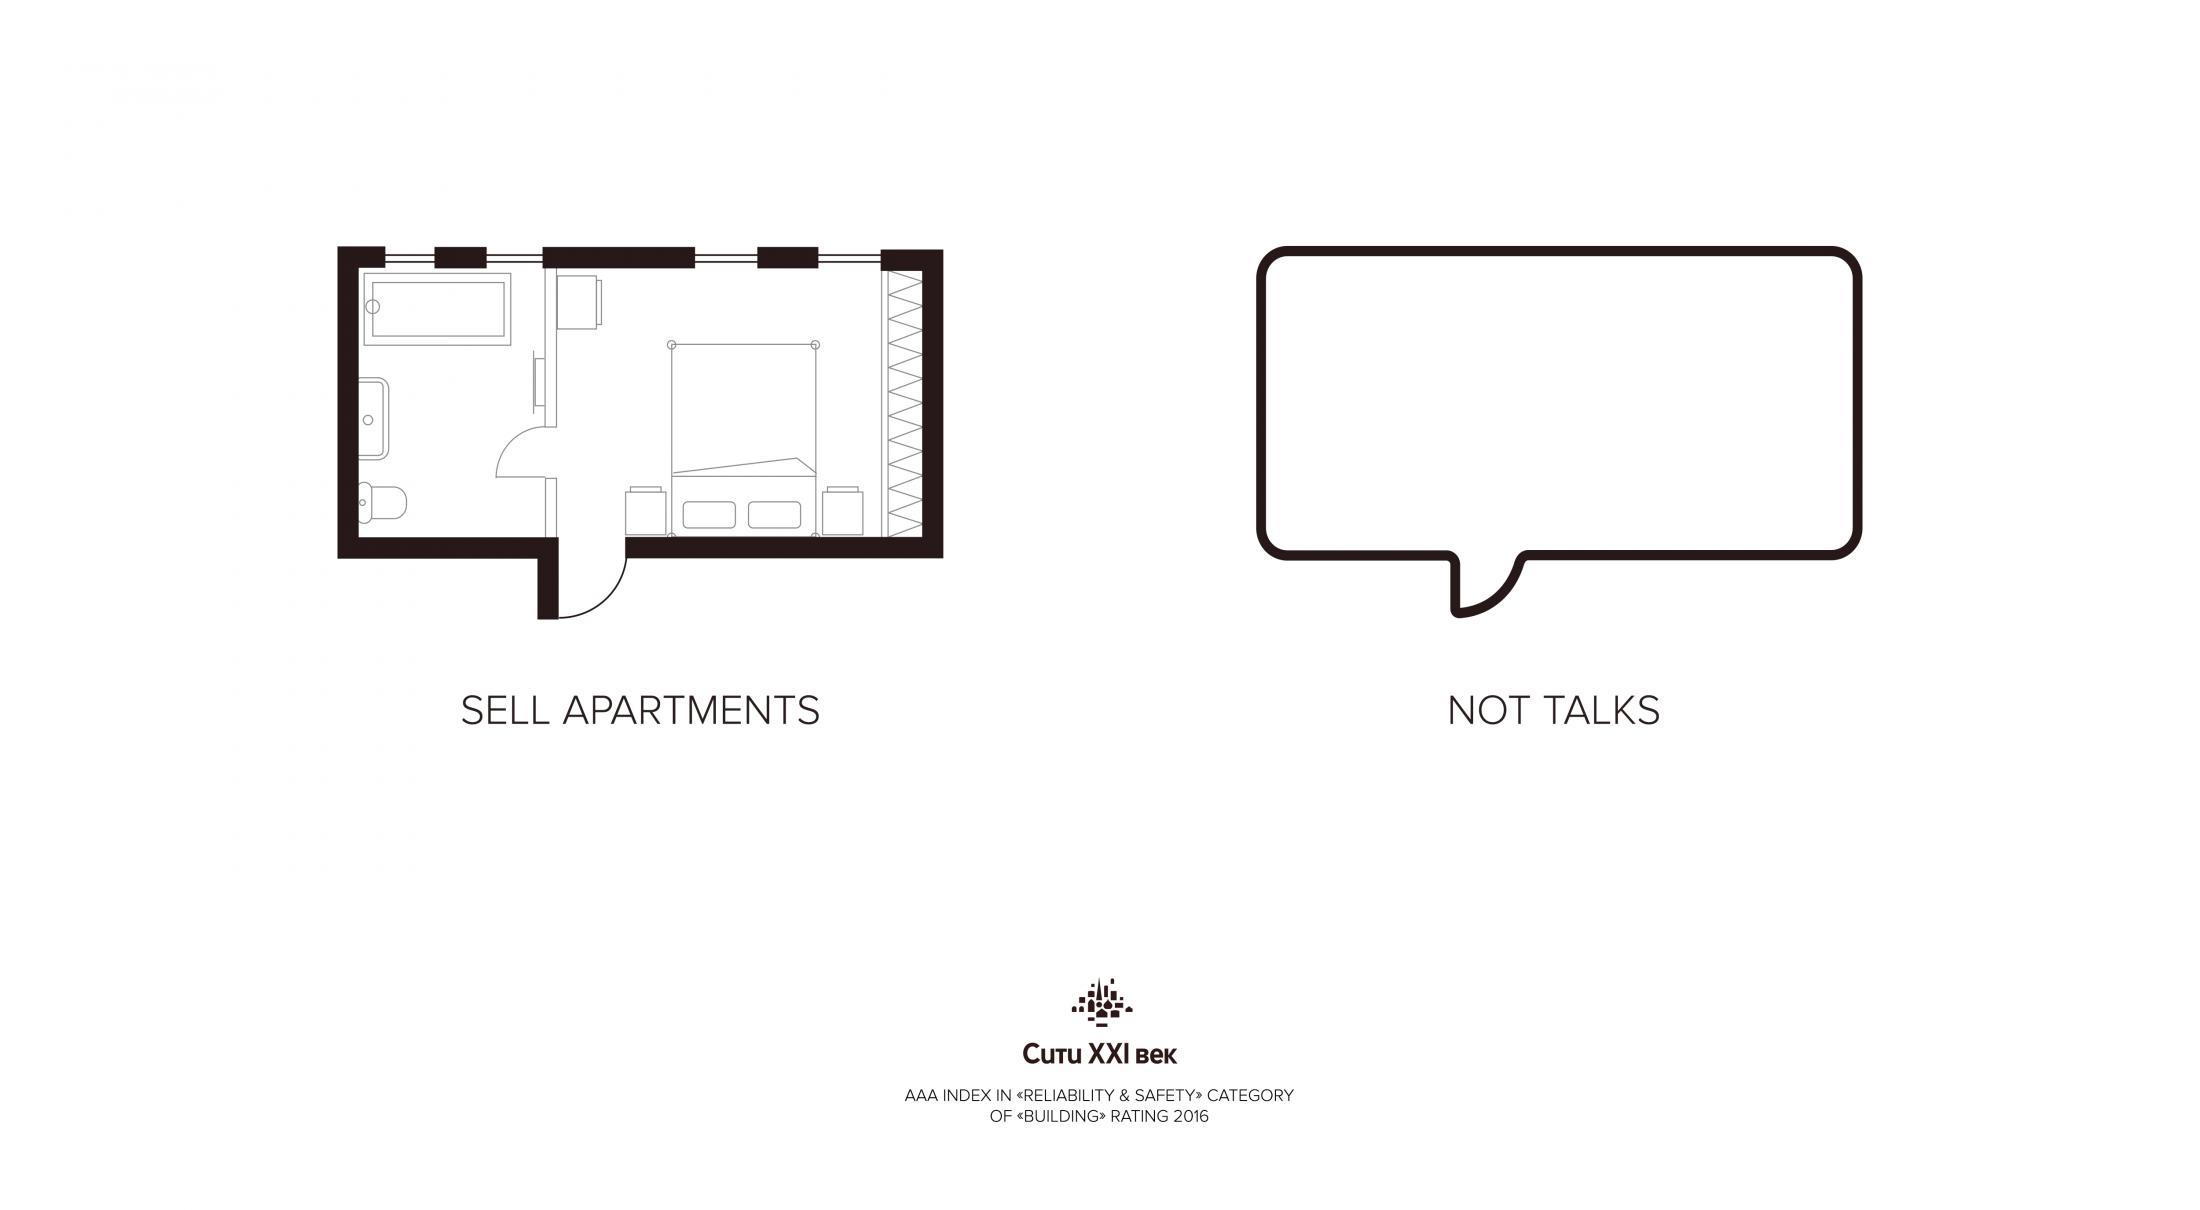 City XXI vek Development Outdoor Ad - Sell apartments — not talks